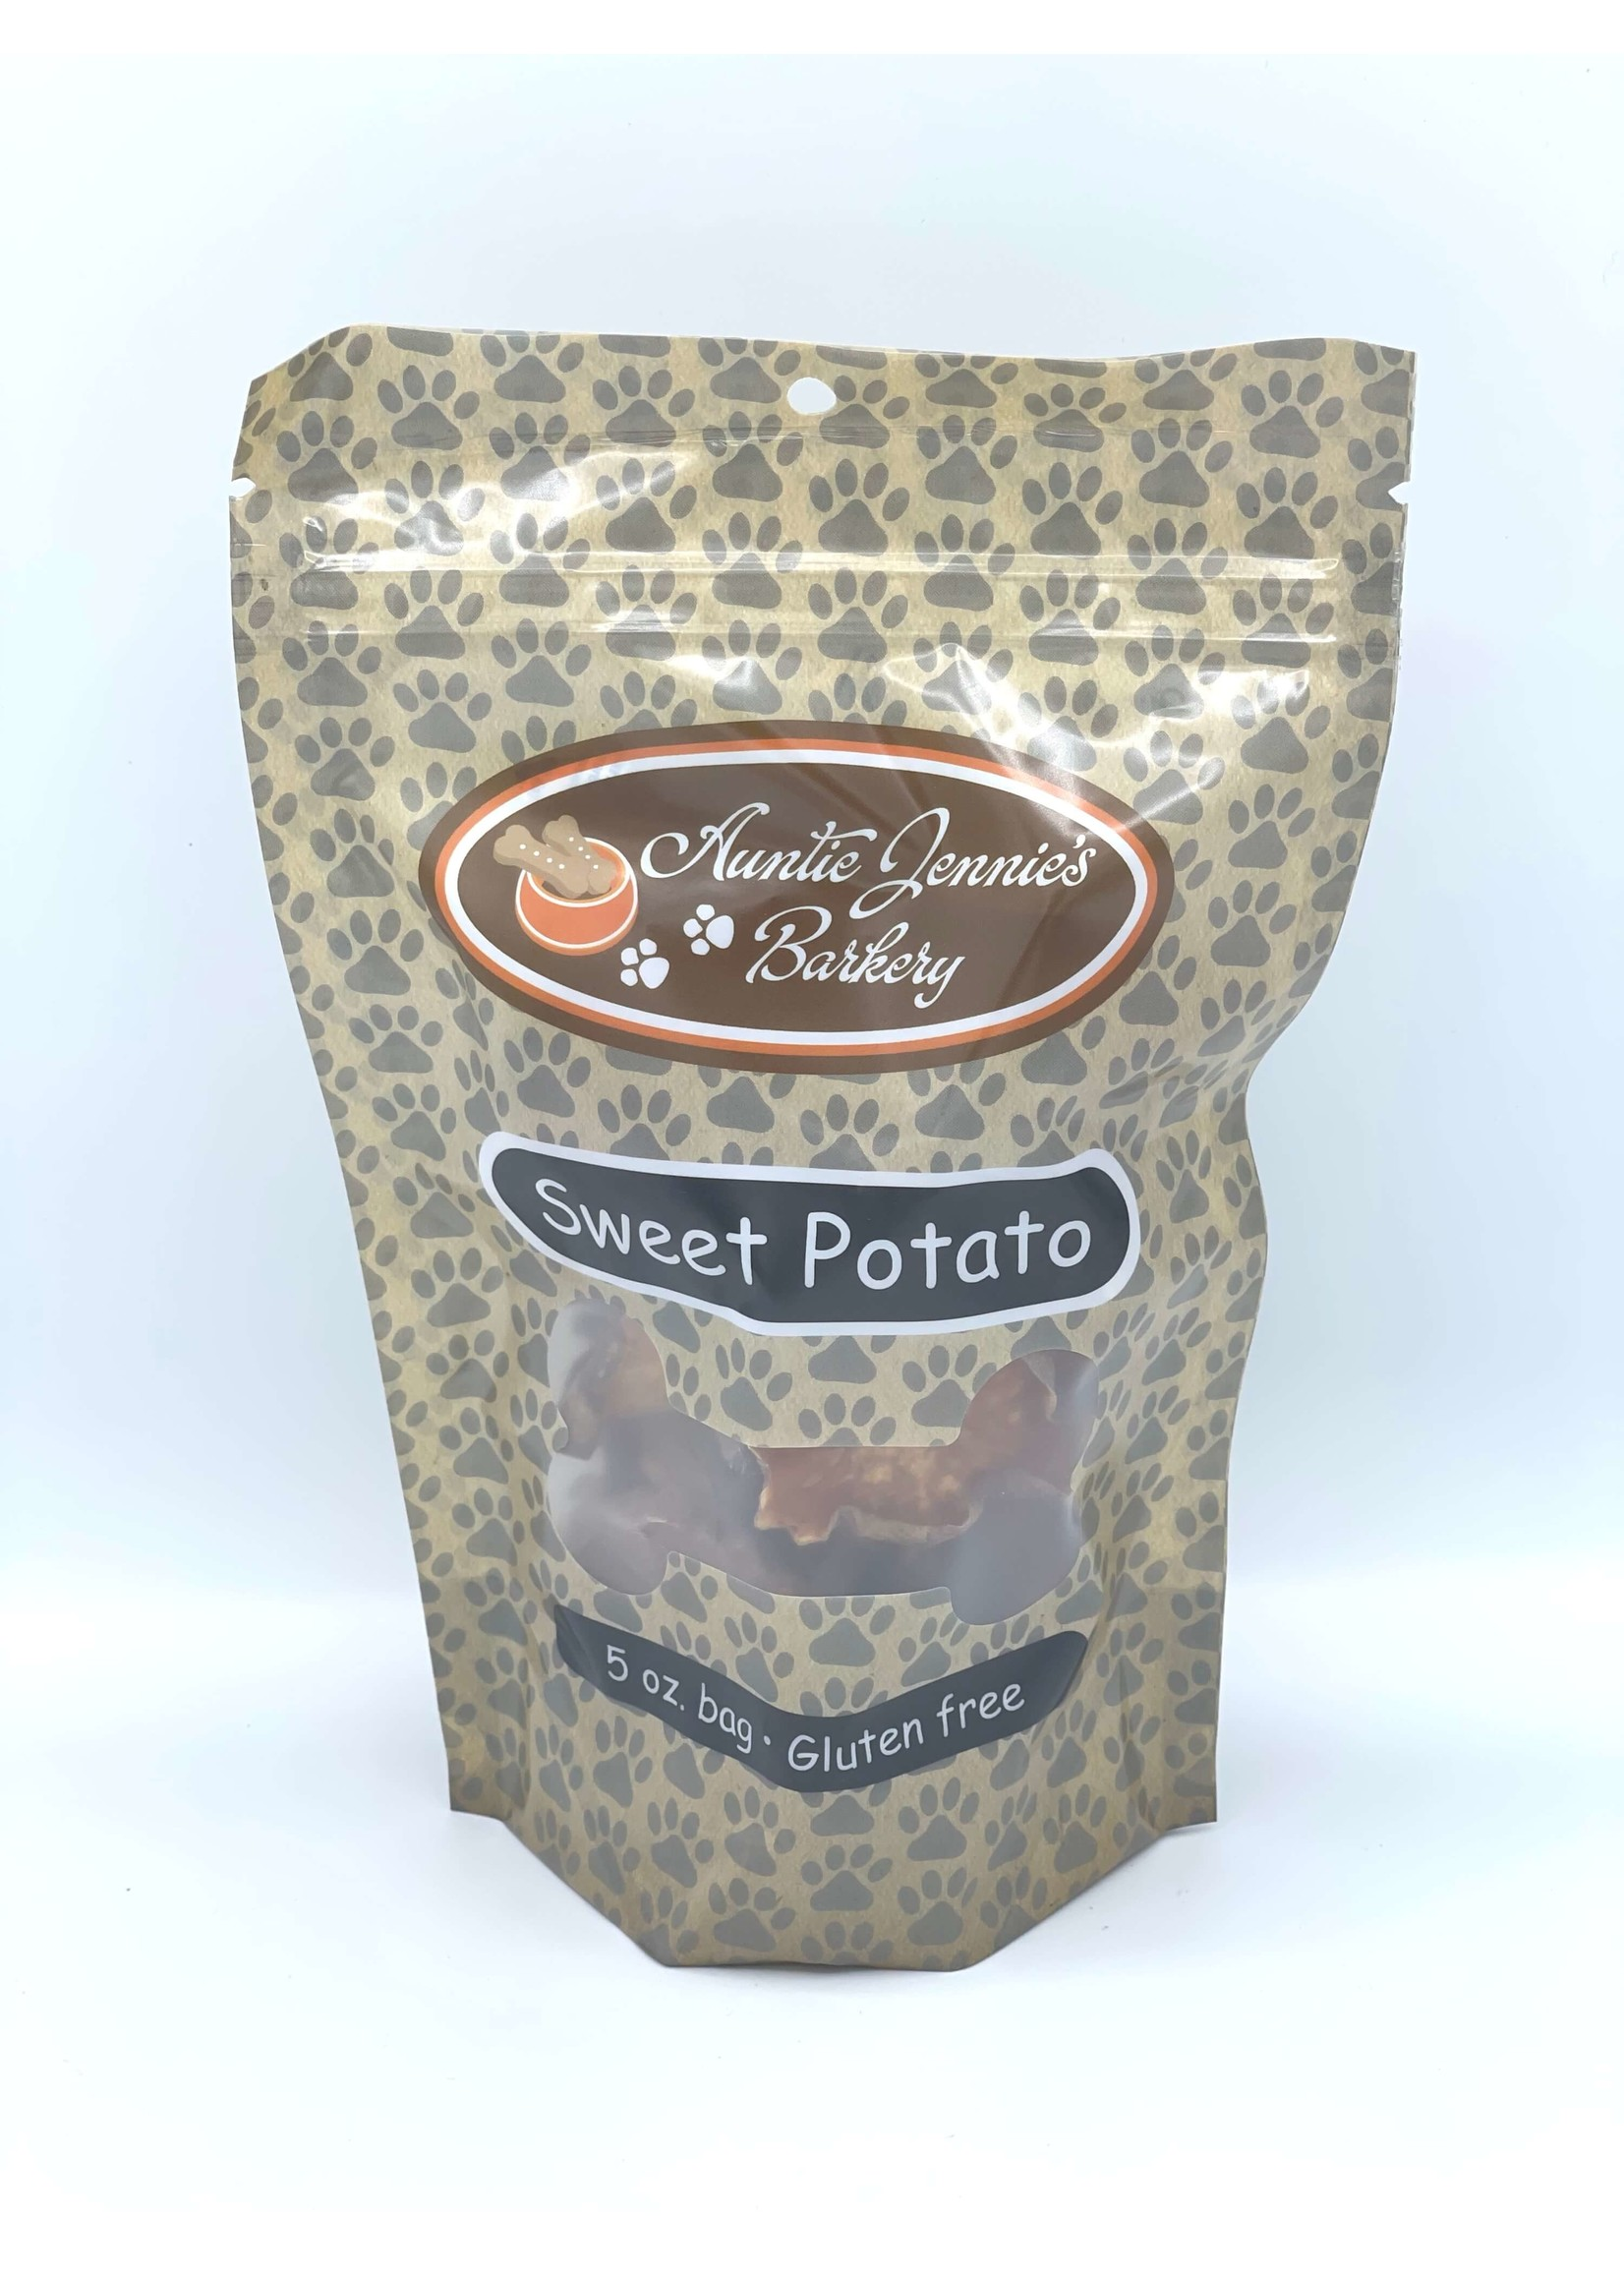 Aunt Jennie's Barkery Sweet Potato Flavor